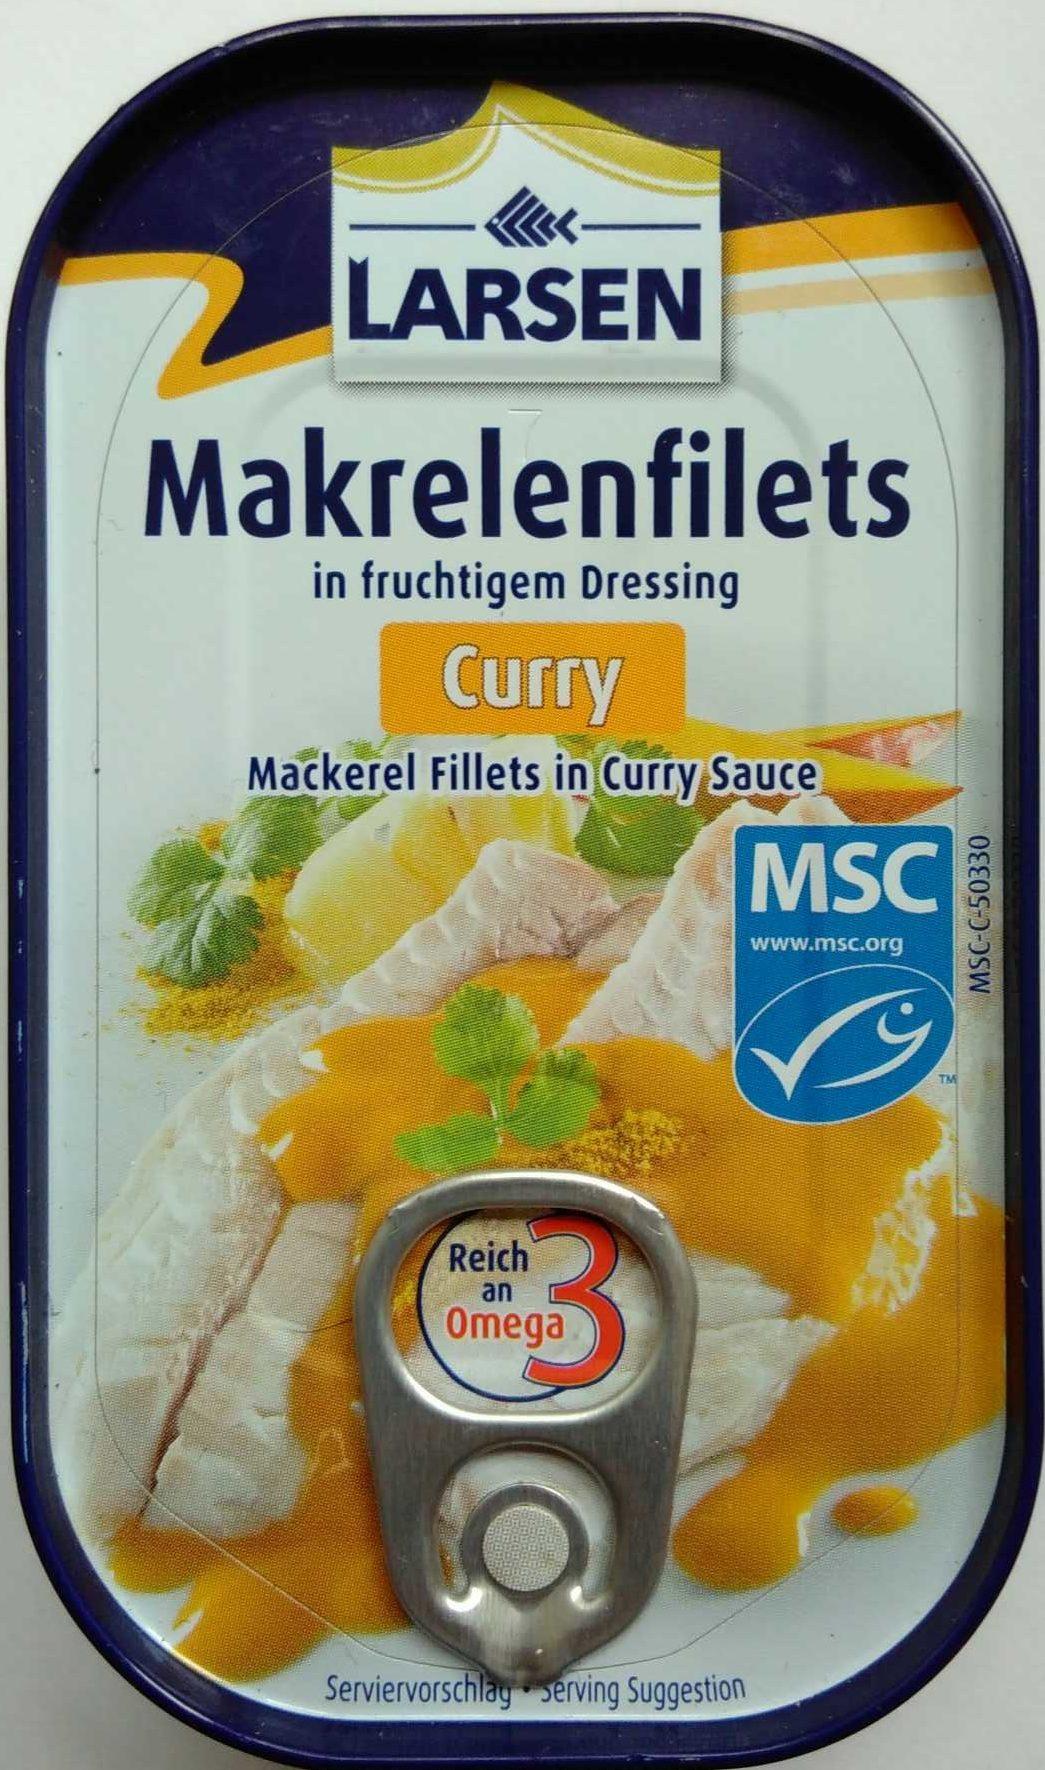 Makrelenfilets Curry - Product